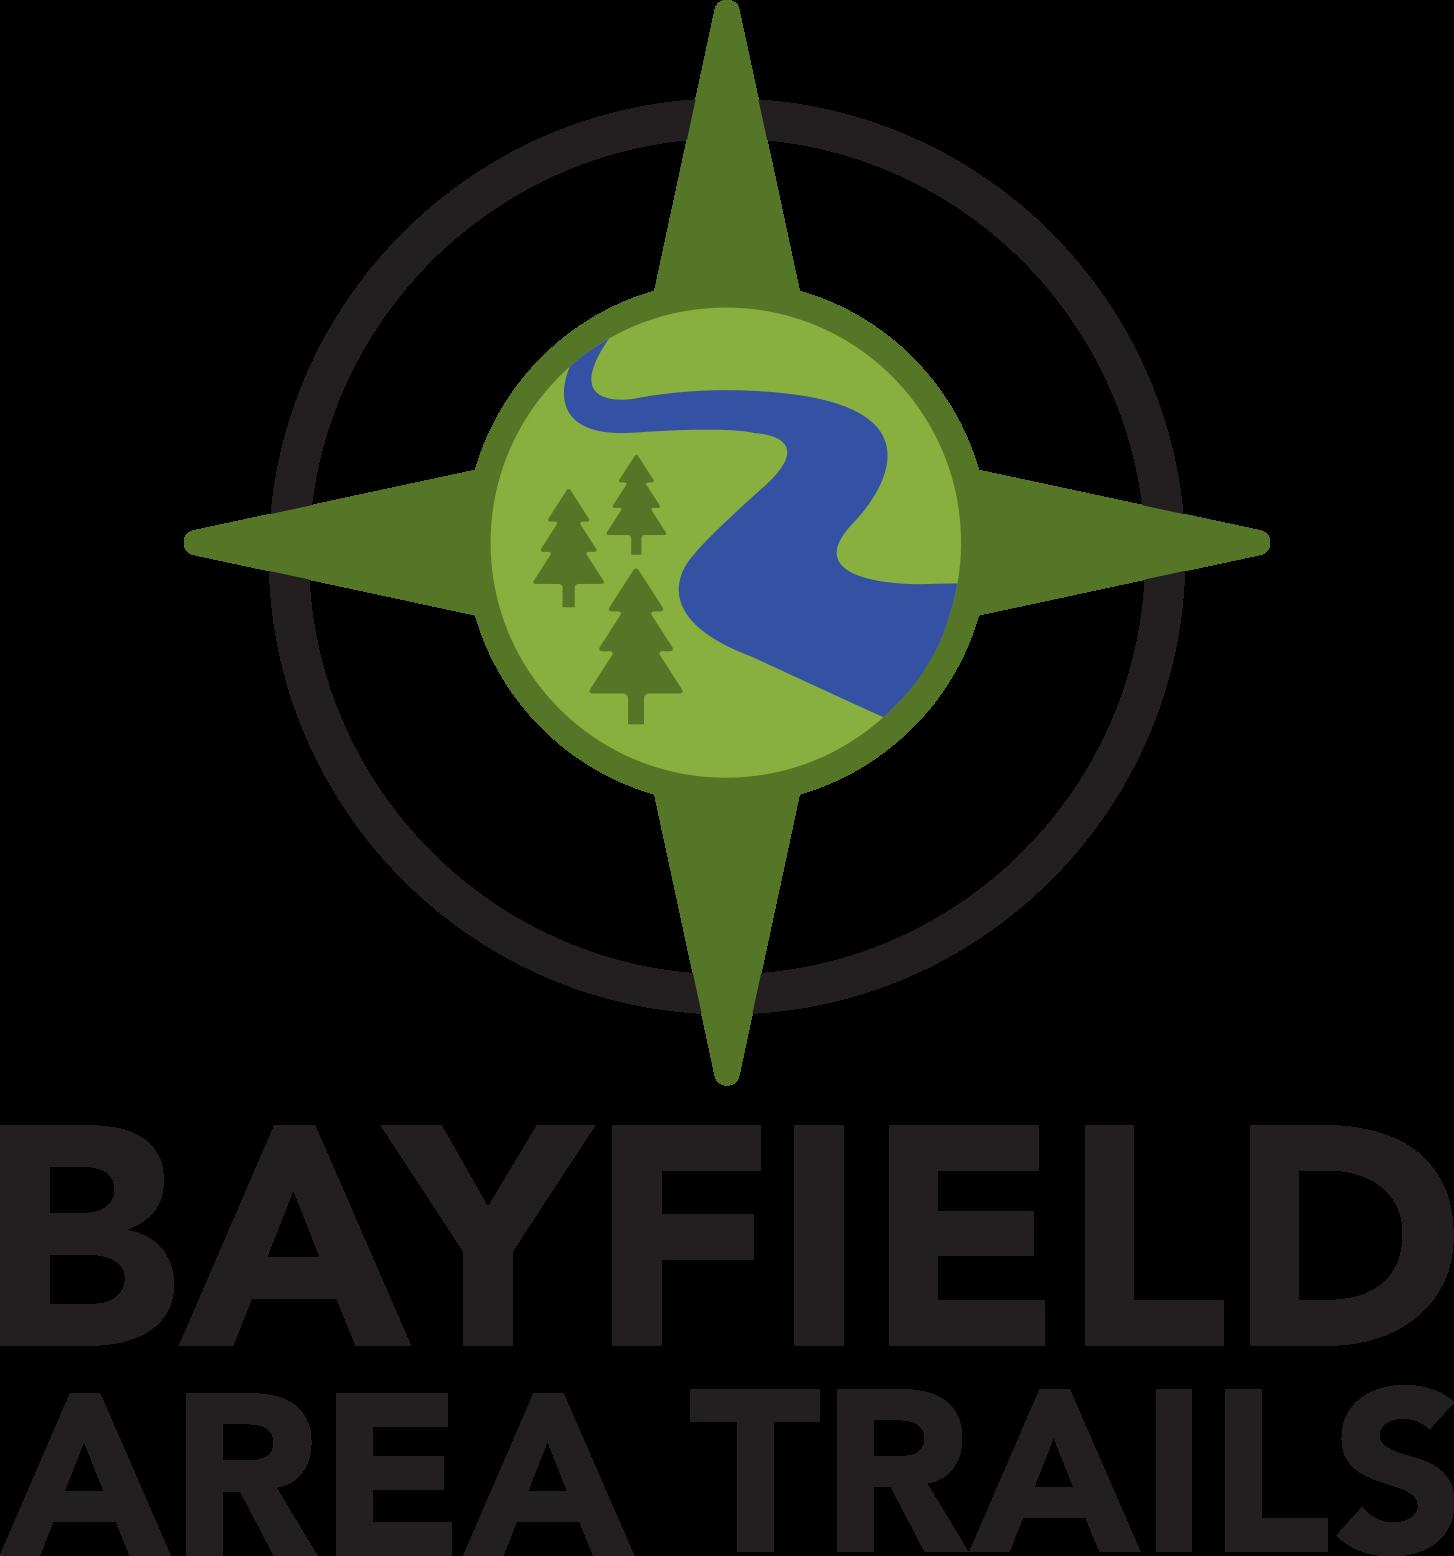 Bayfield Area Trails Logo